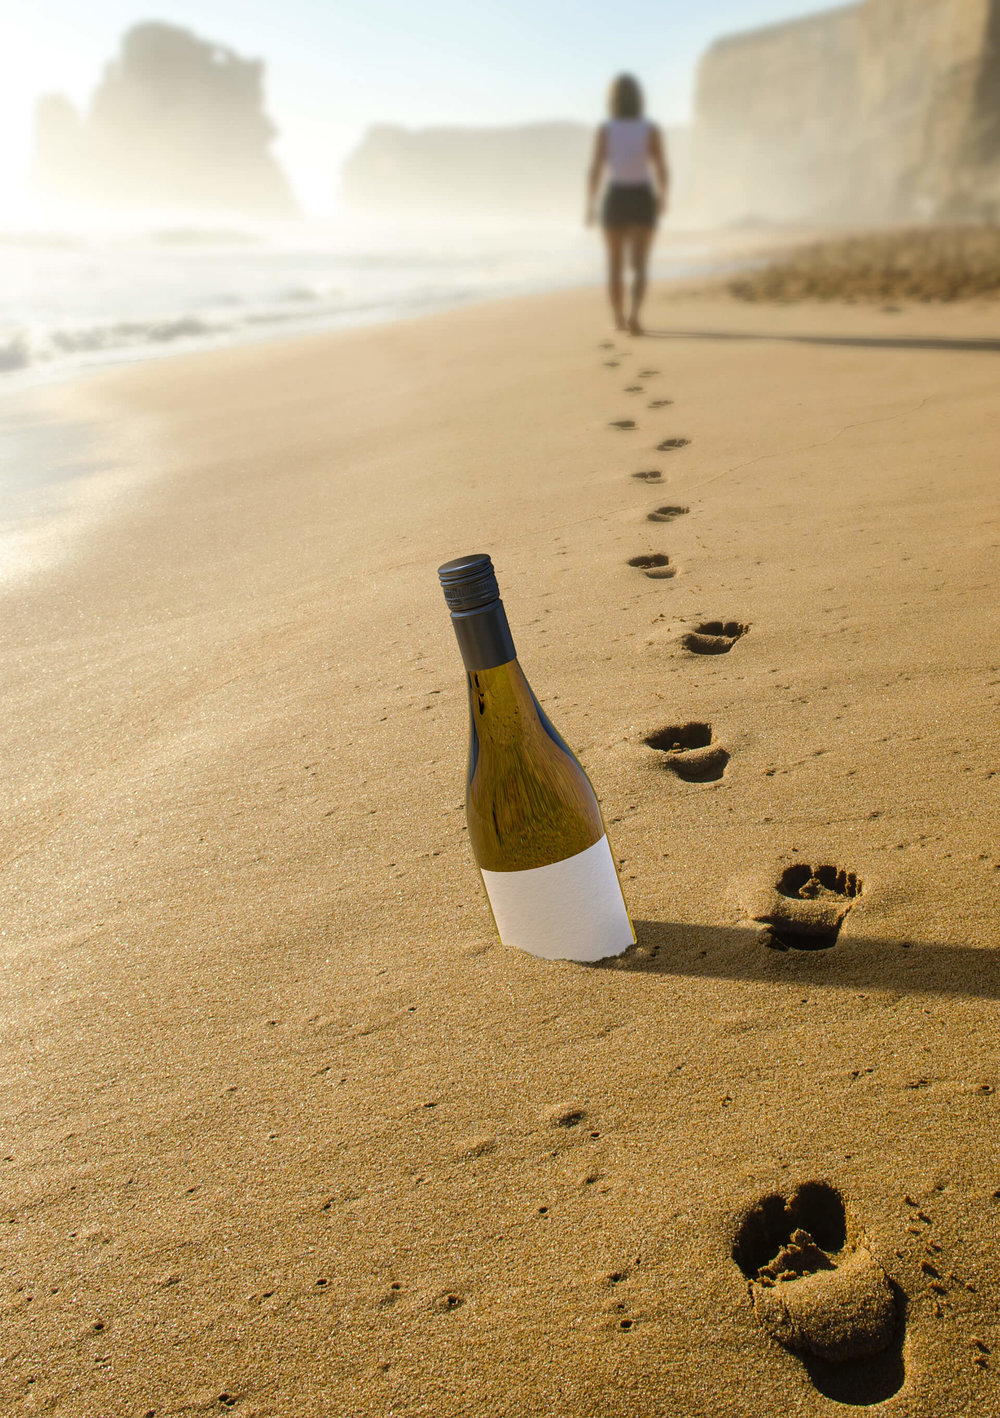 Leaving the footprints